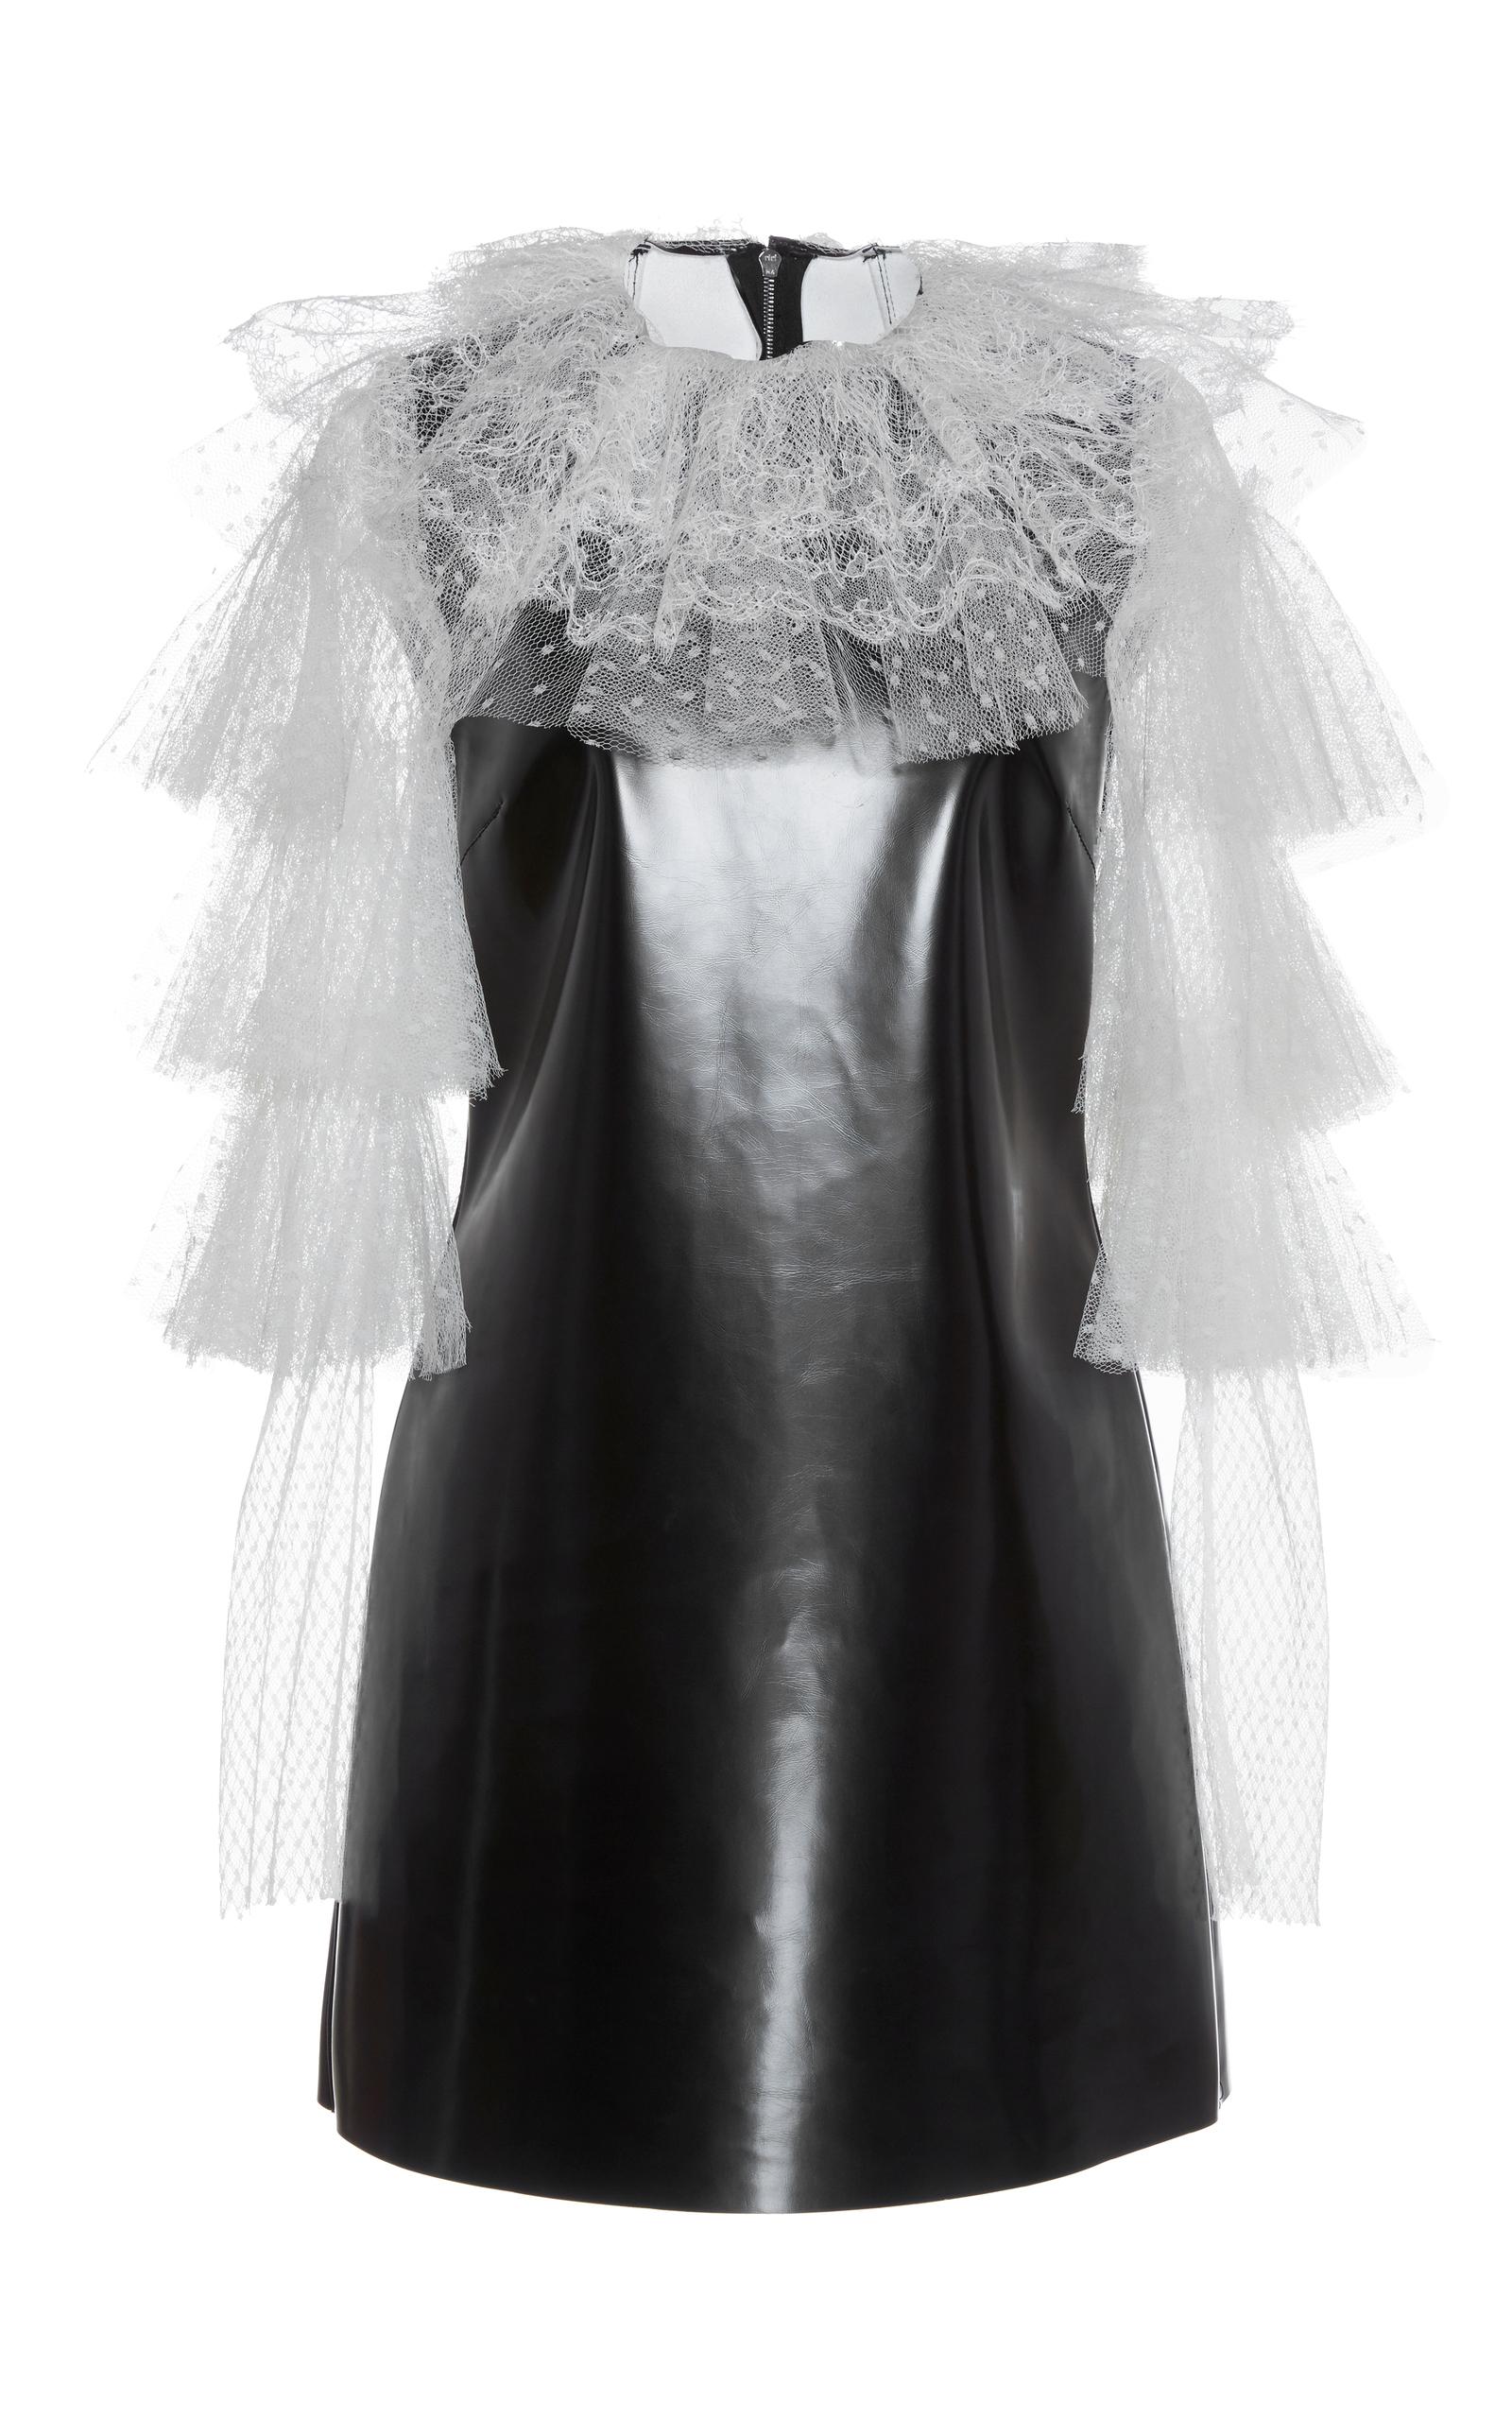 lace mini dress - Black Philosophy di Lorenzo Serafini 7MofOL